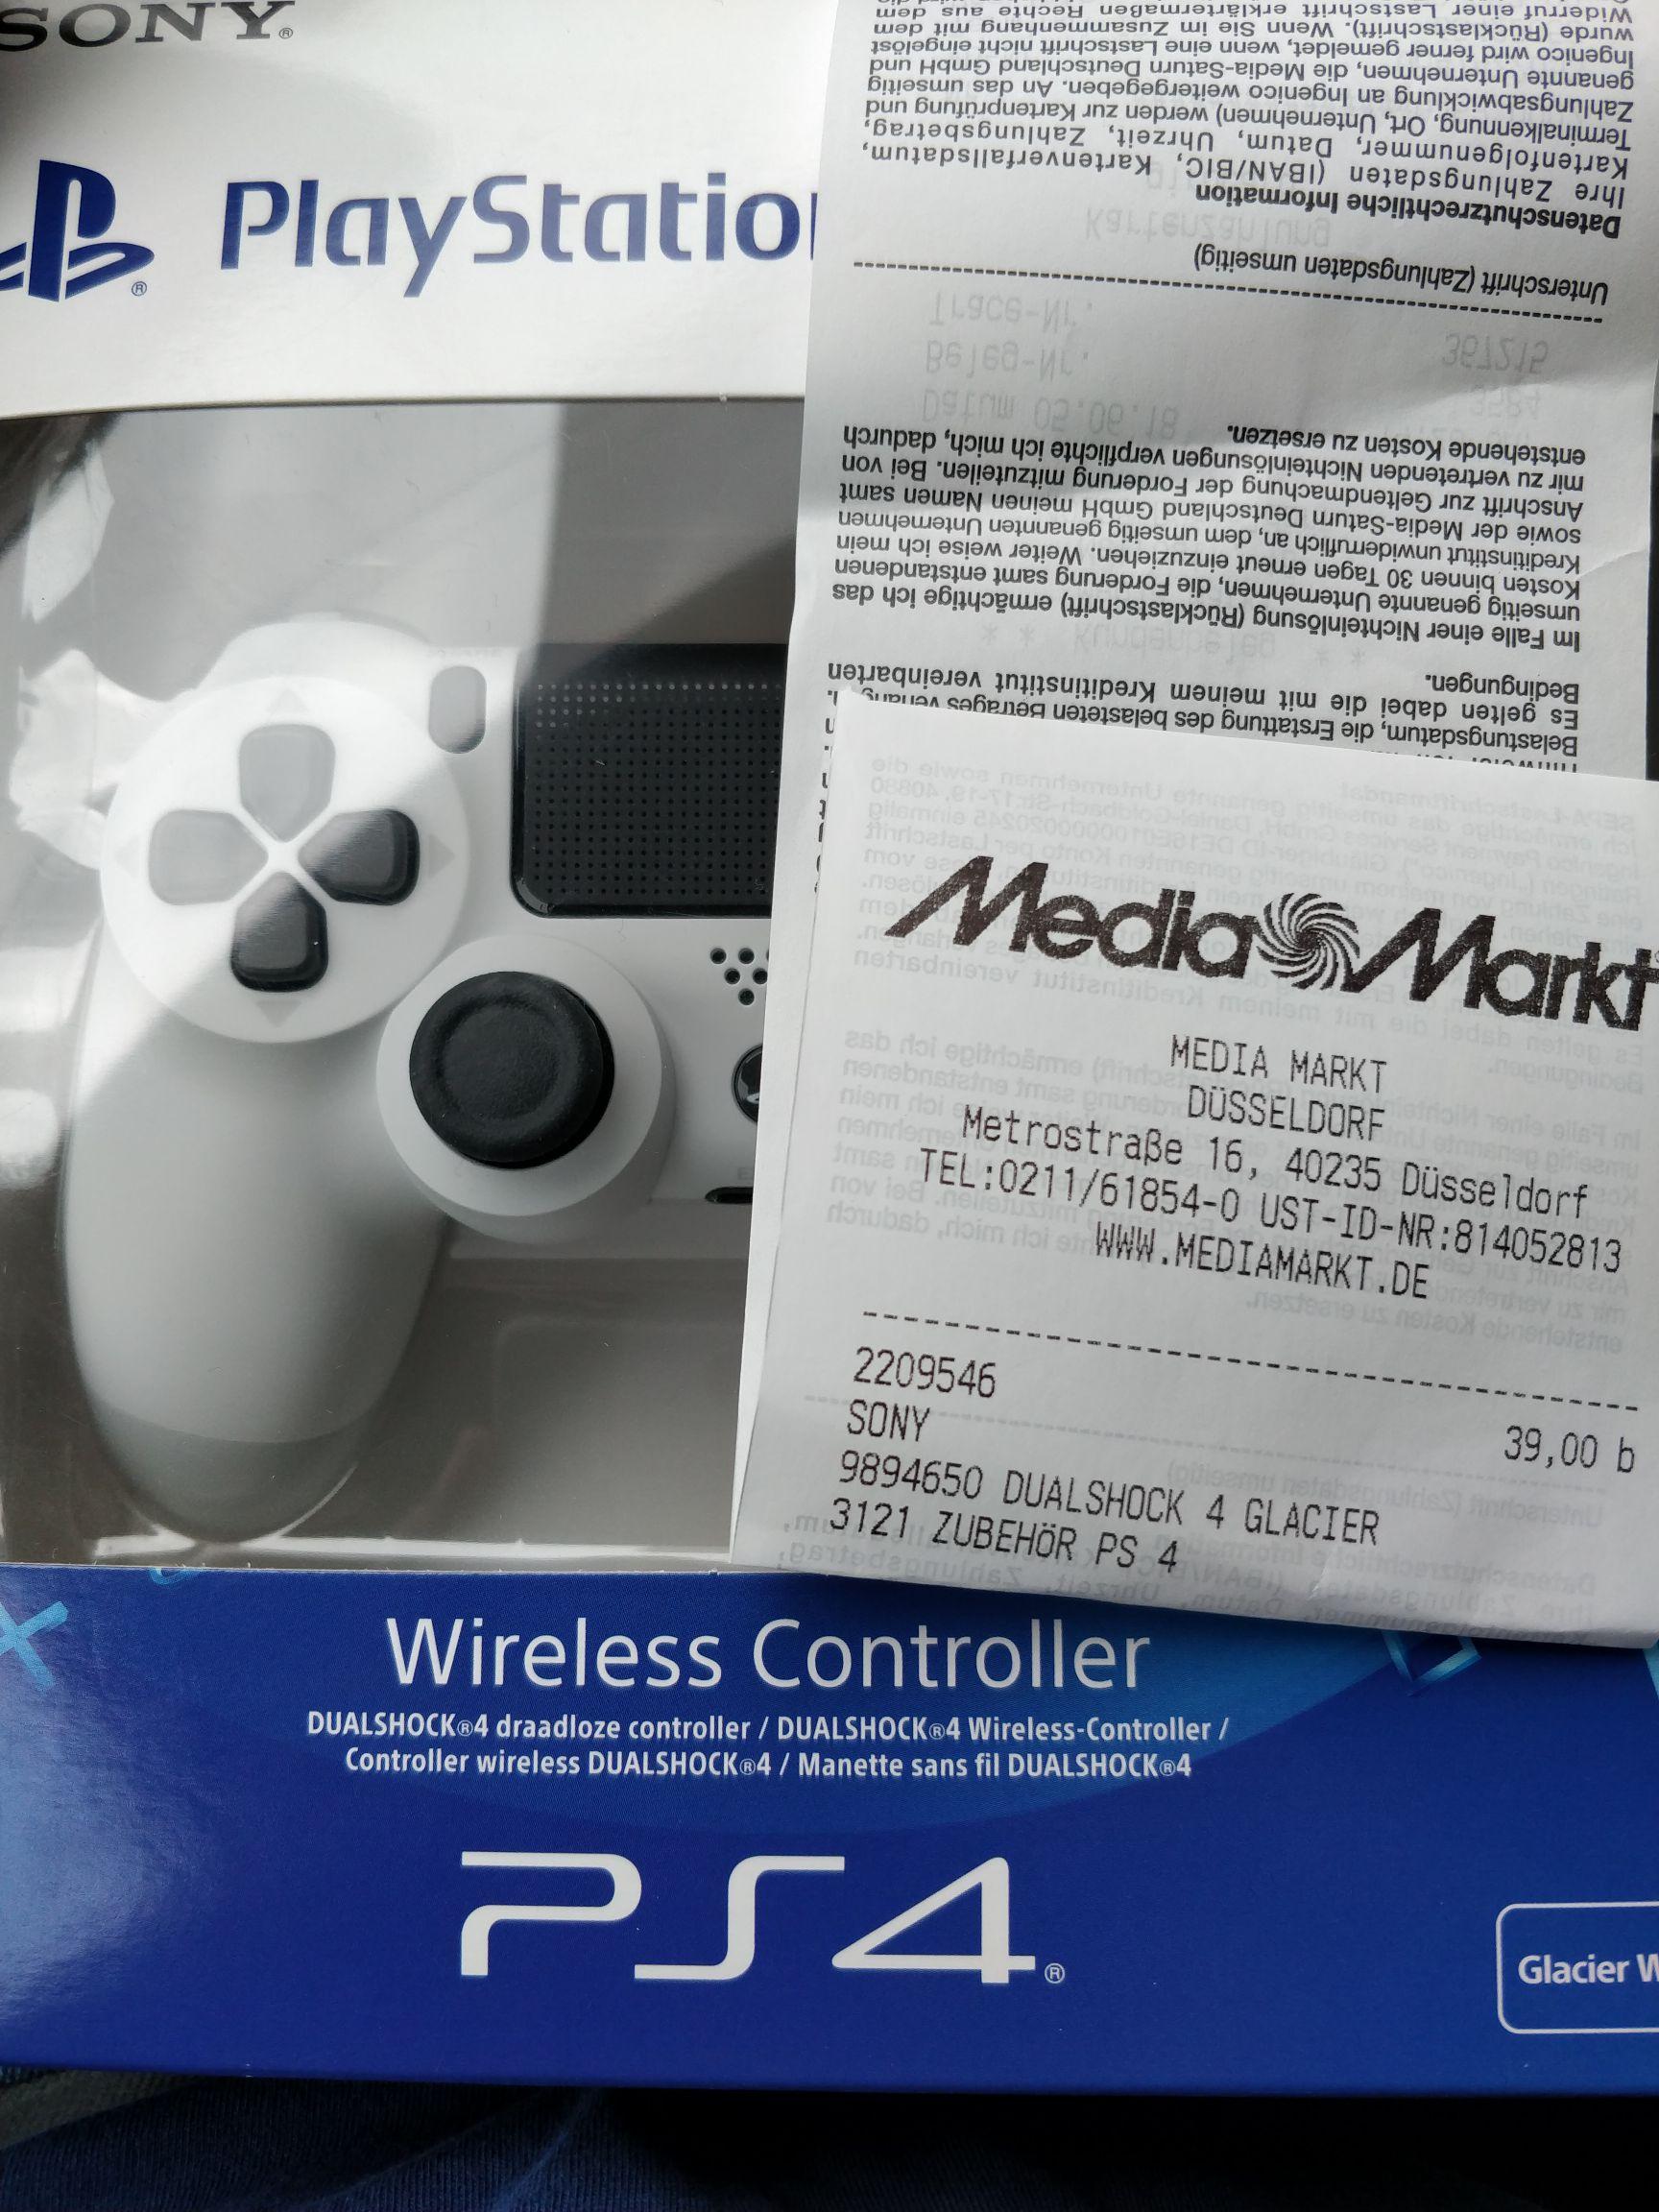 Mediamarkt (Düsseldorf Metro) Sony Playstation Dualshock 4  days of play Angebot ab heute